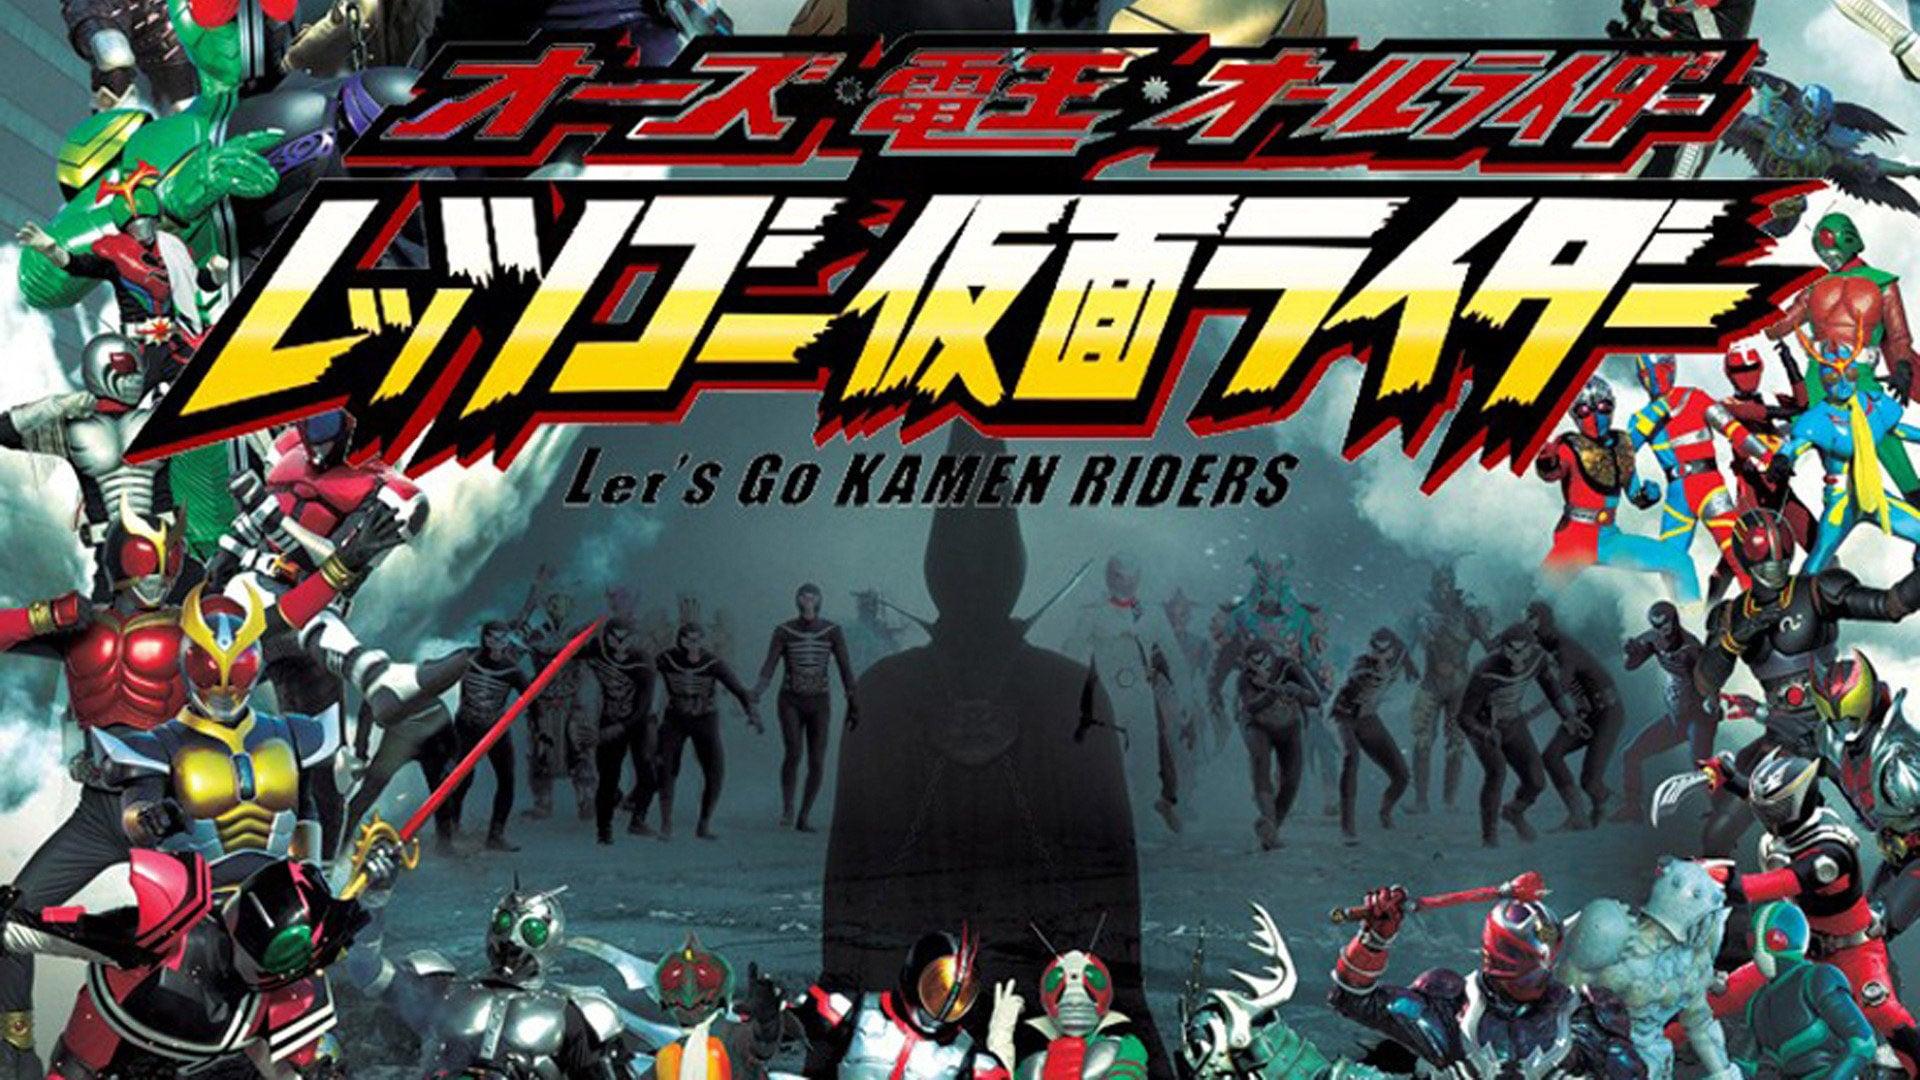 Ooo Den O All Riders Lets Go Kamen Riders 1